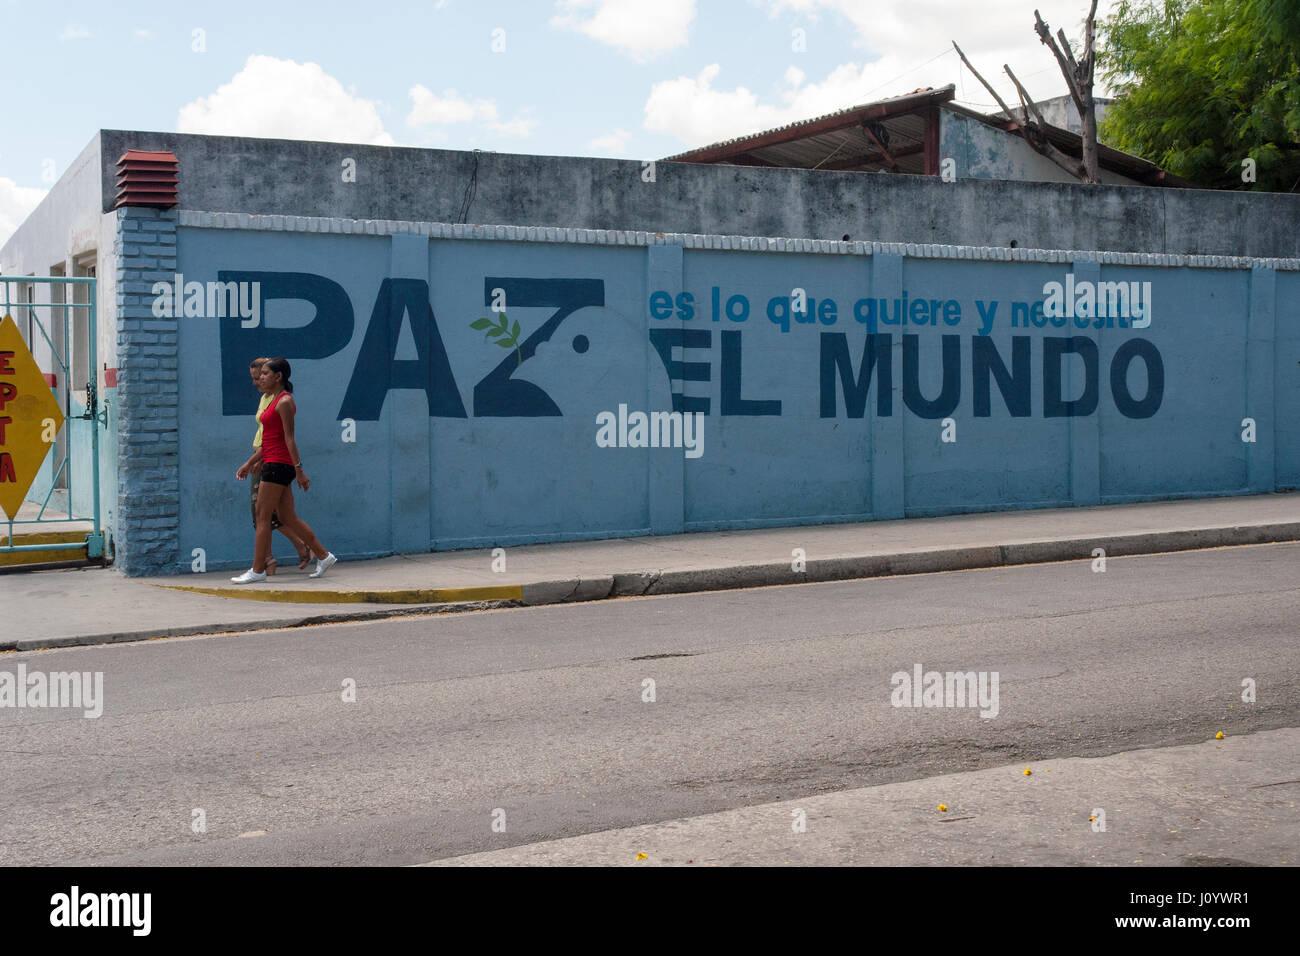 Wallpainting pacifista en La Habana, Cuba Imagen De Stock